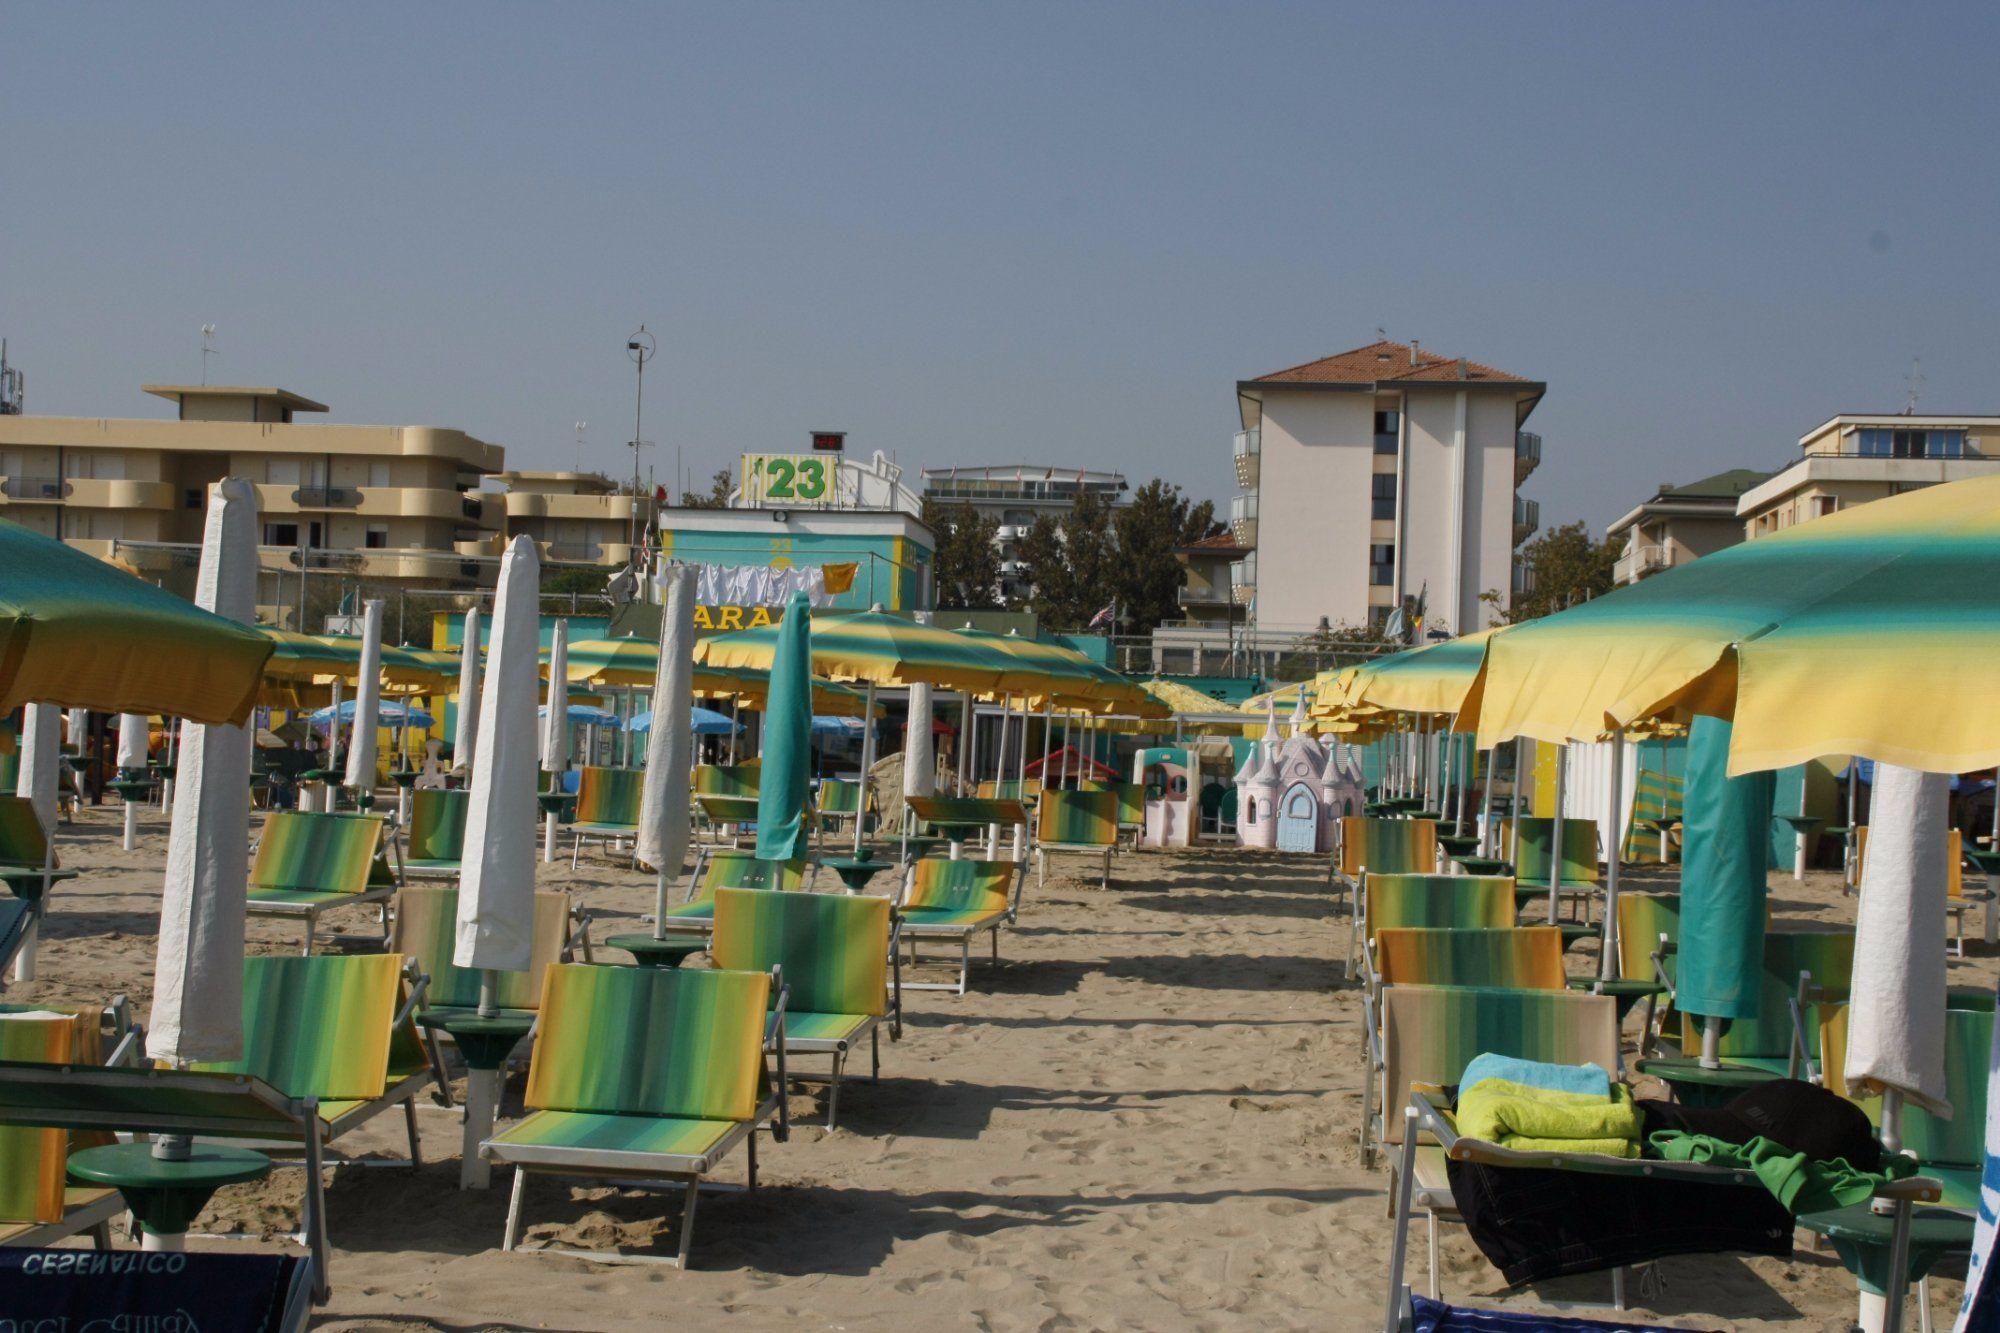 Zara Beach Cesenatico Italy Top Tips Before You Go Tripadvisor Trip Advisor Forli Cesena